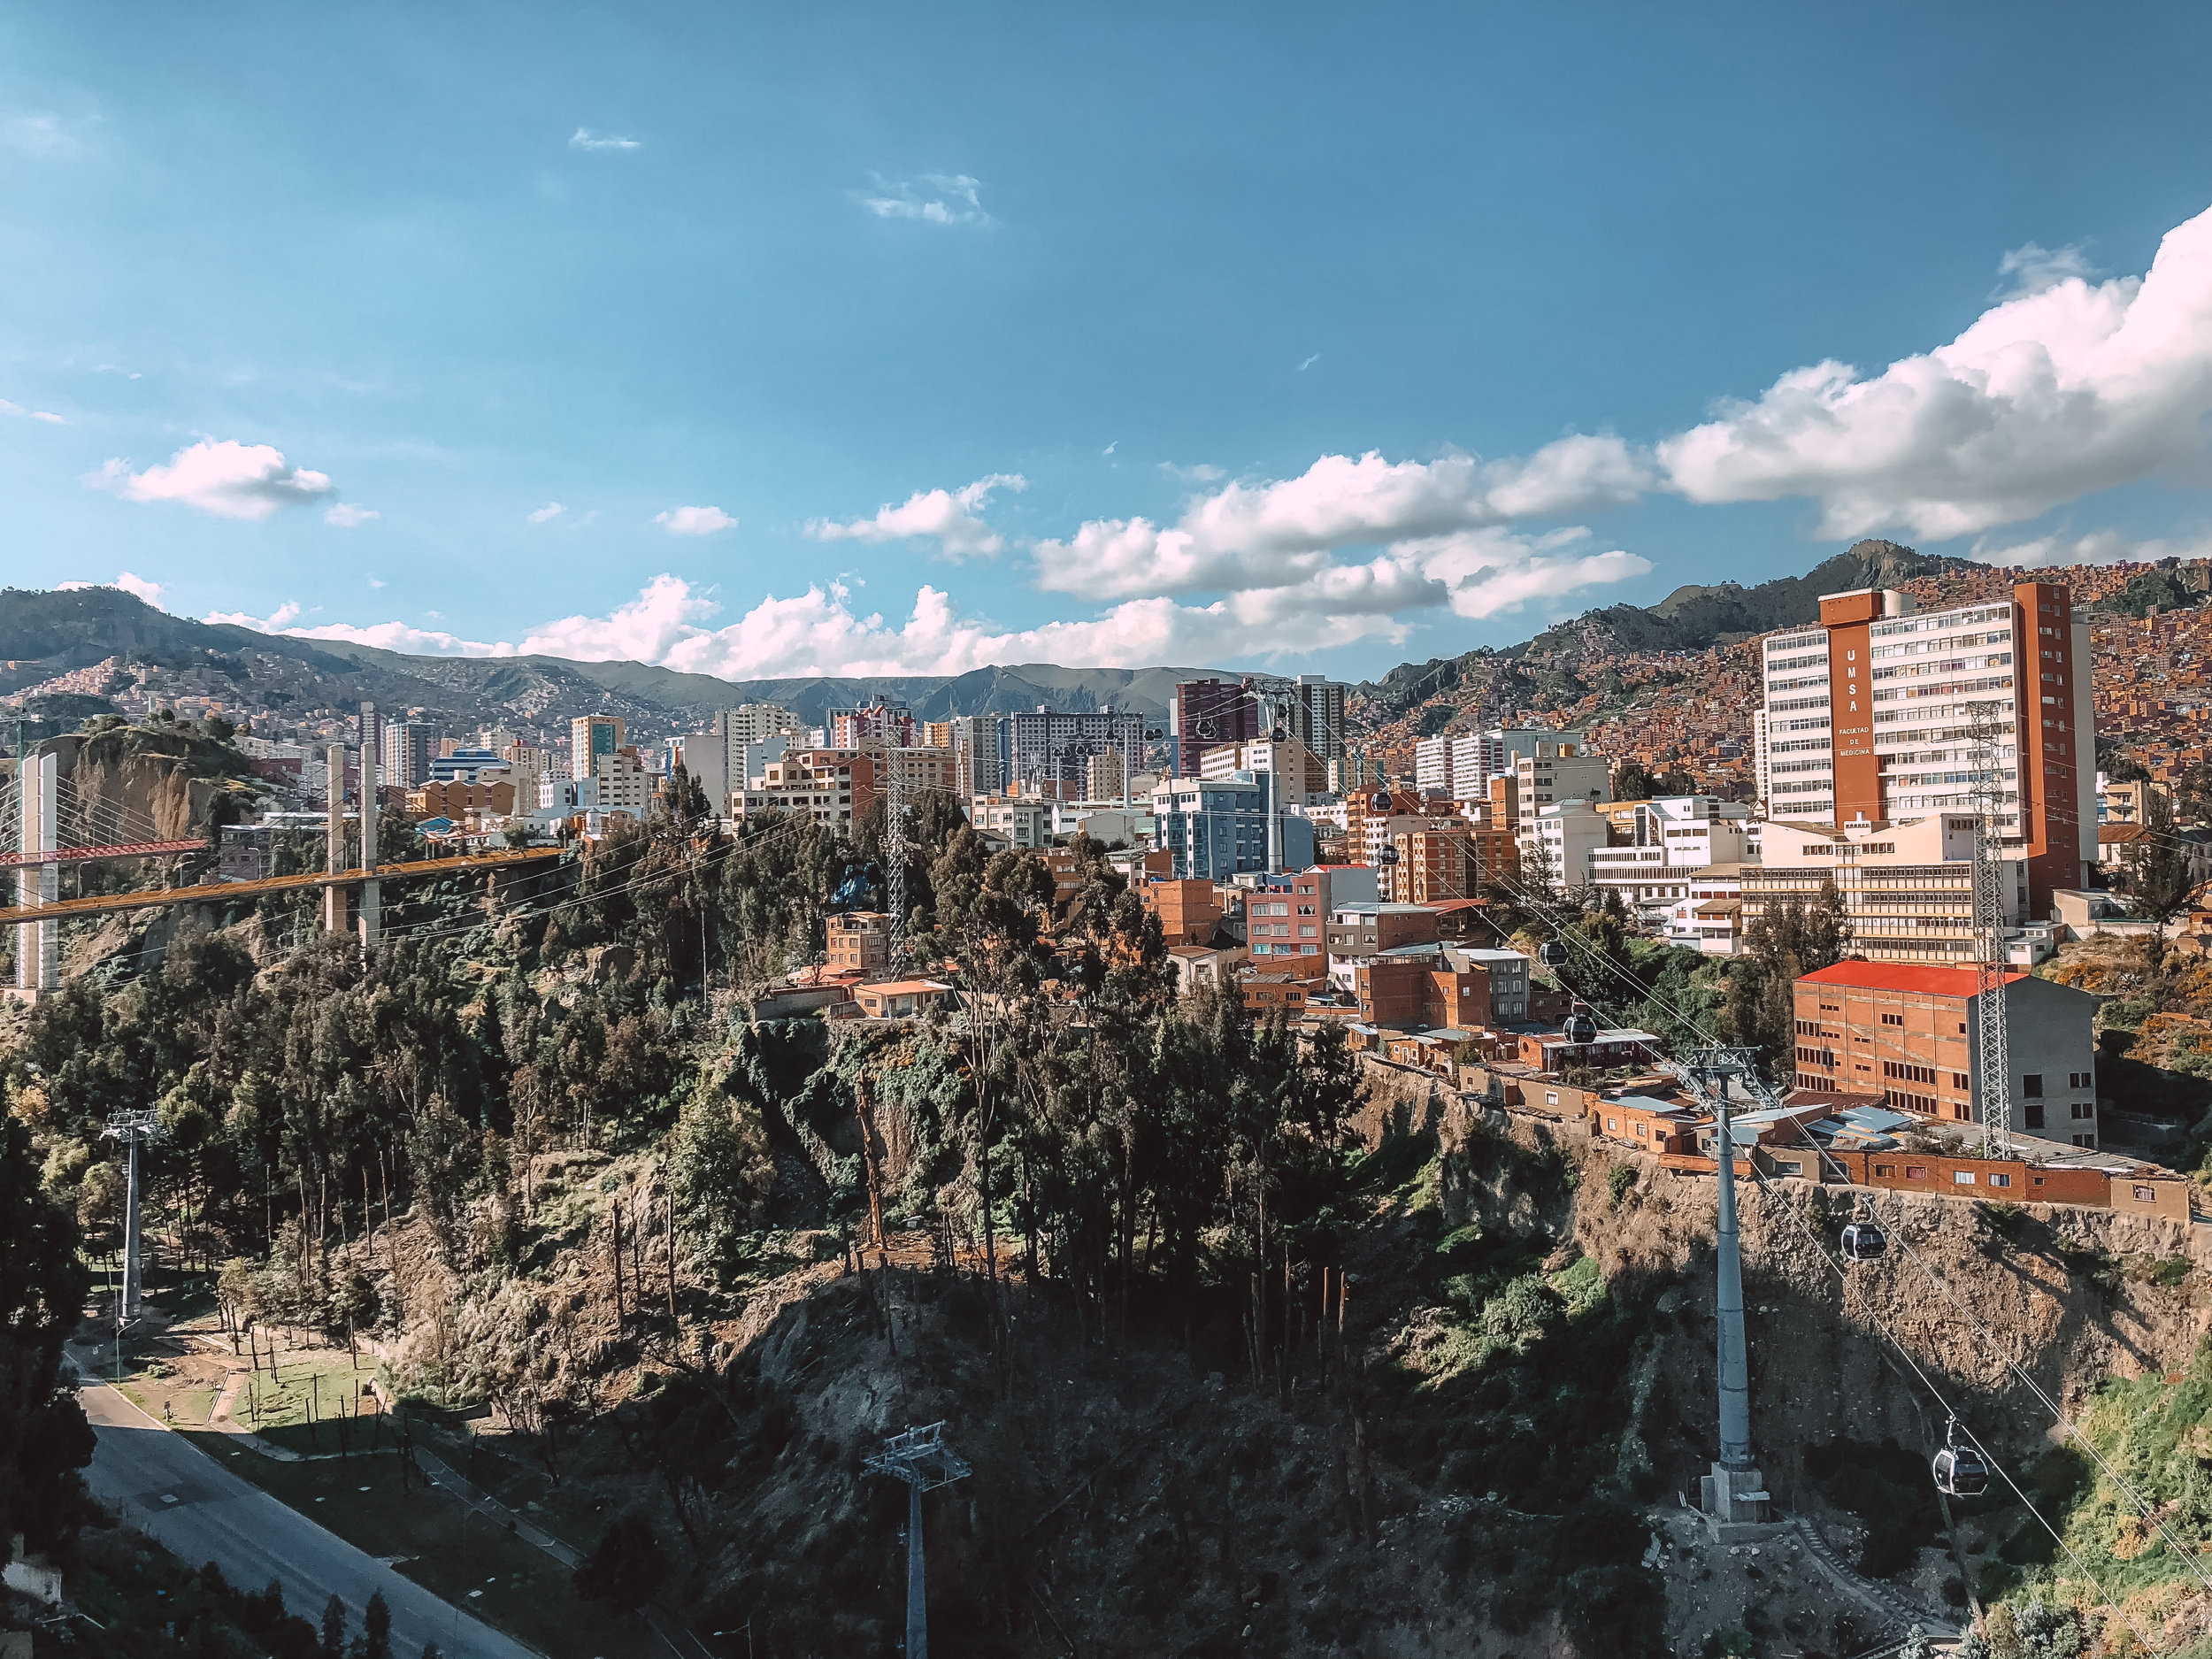 visiter-la-paz-bolivie-the-cheerfulist